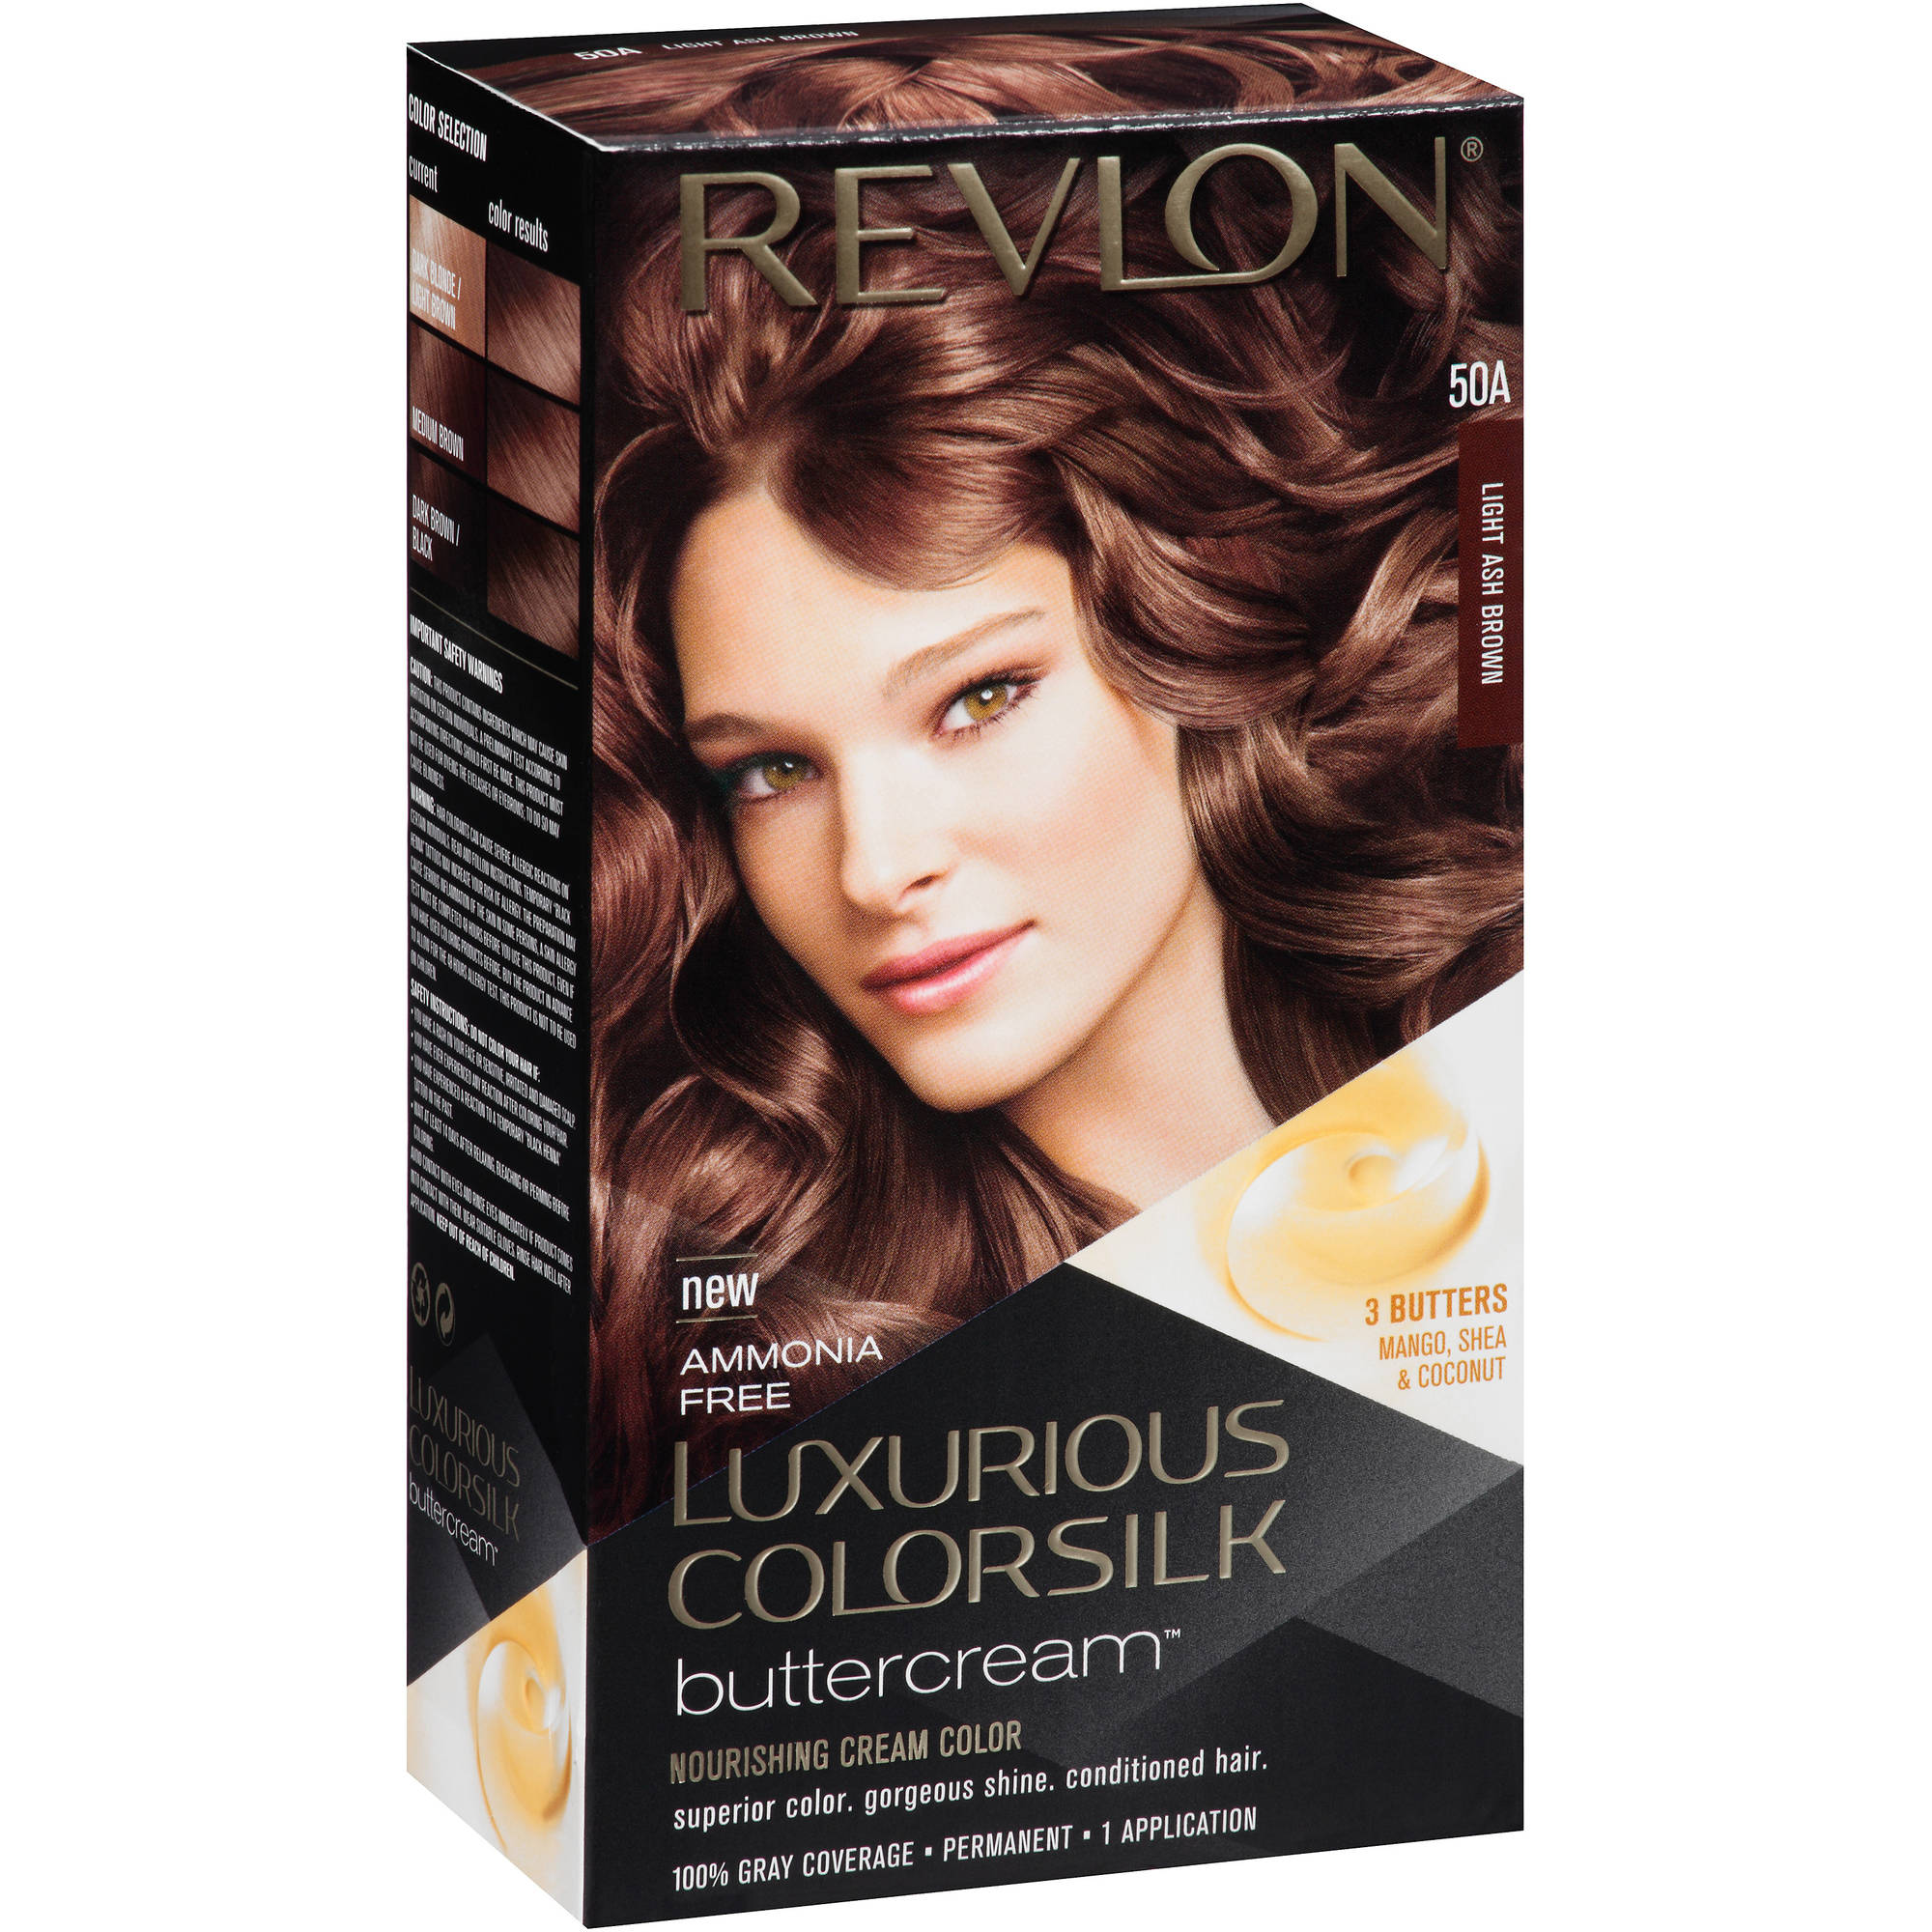 Dark Ash Brown Revlon revlon luxurious colorsilk buttercream ...